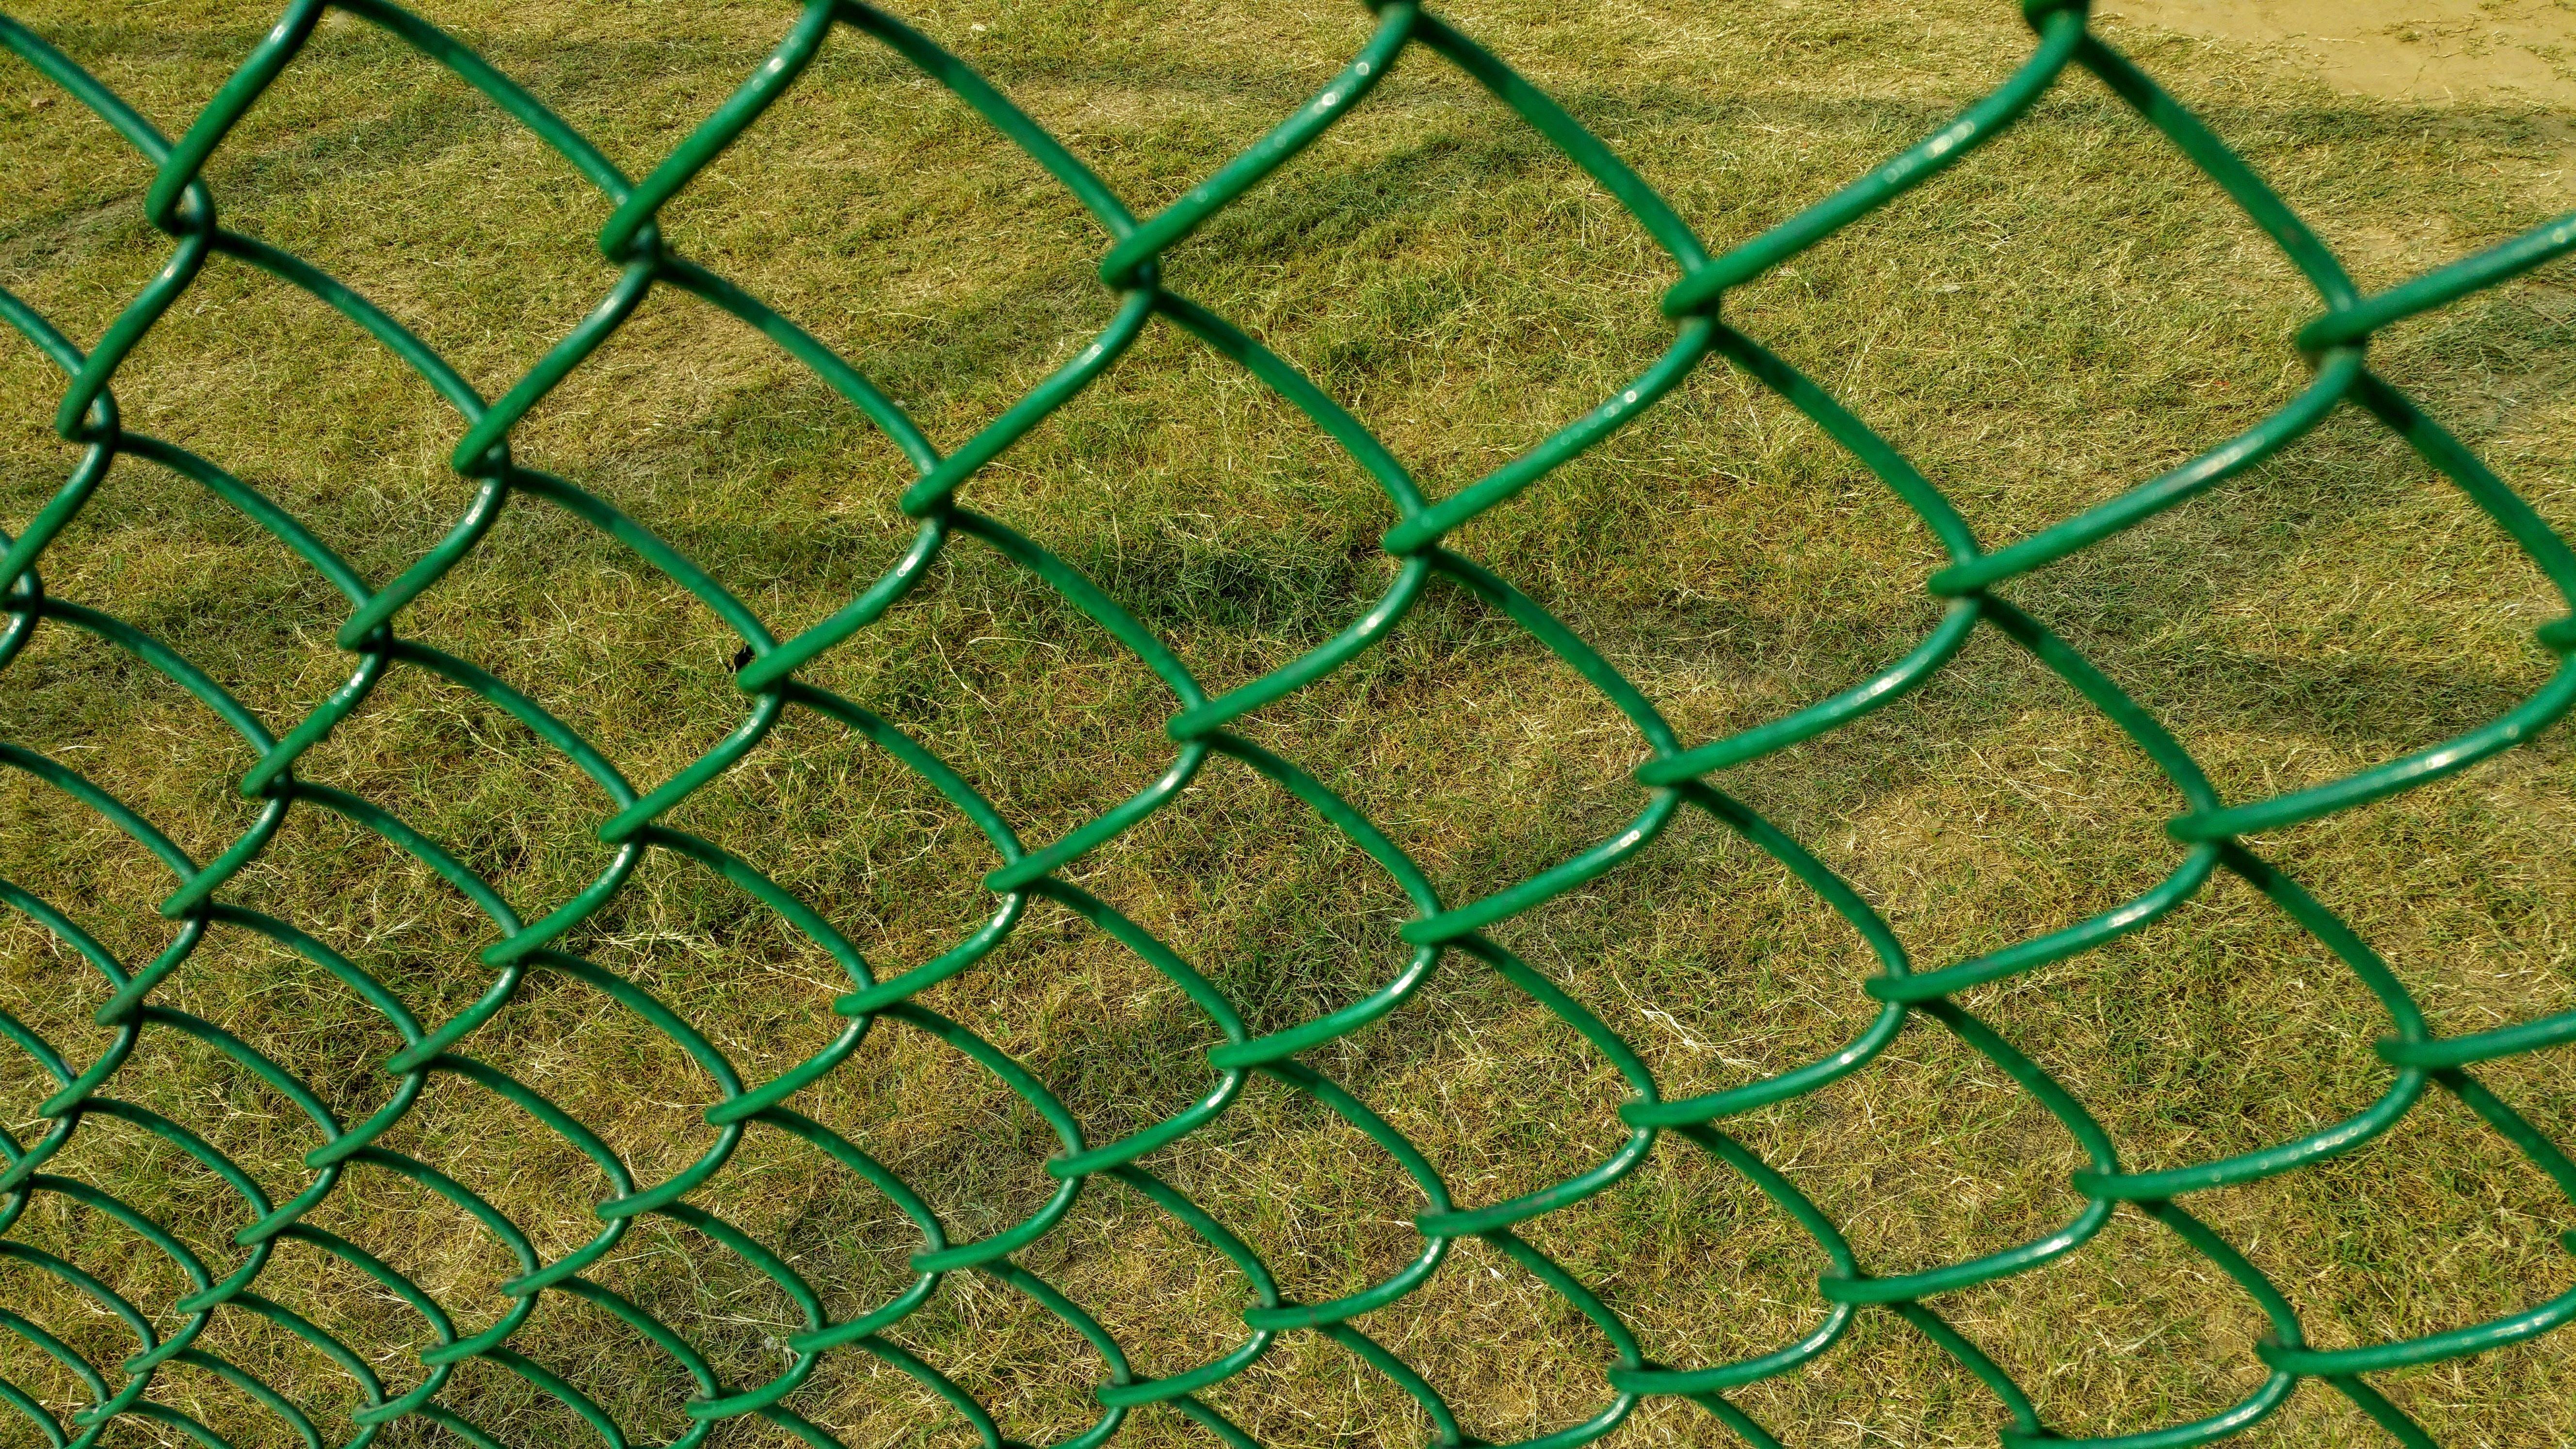 Green Cyclone Fence